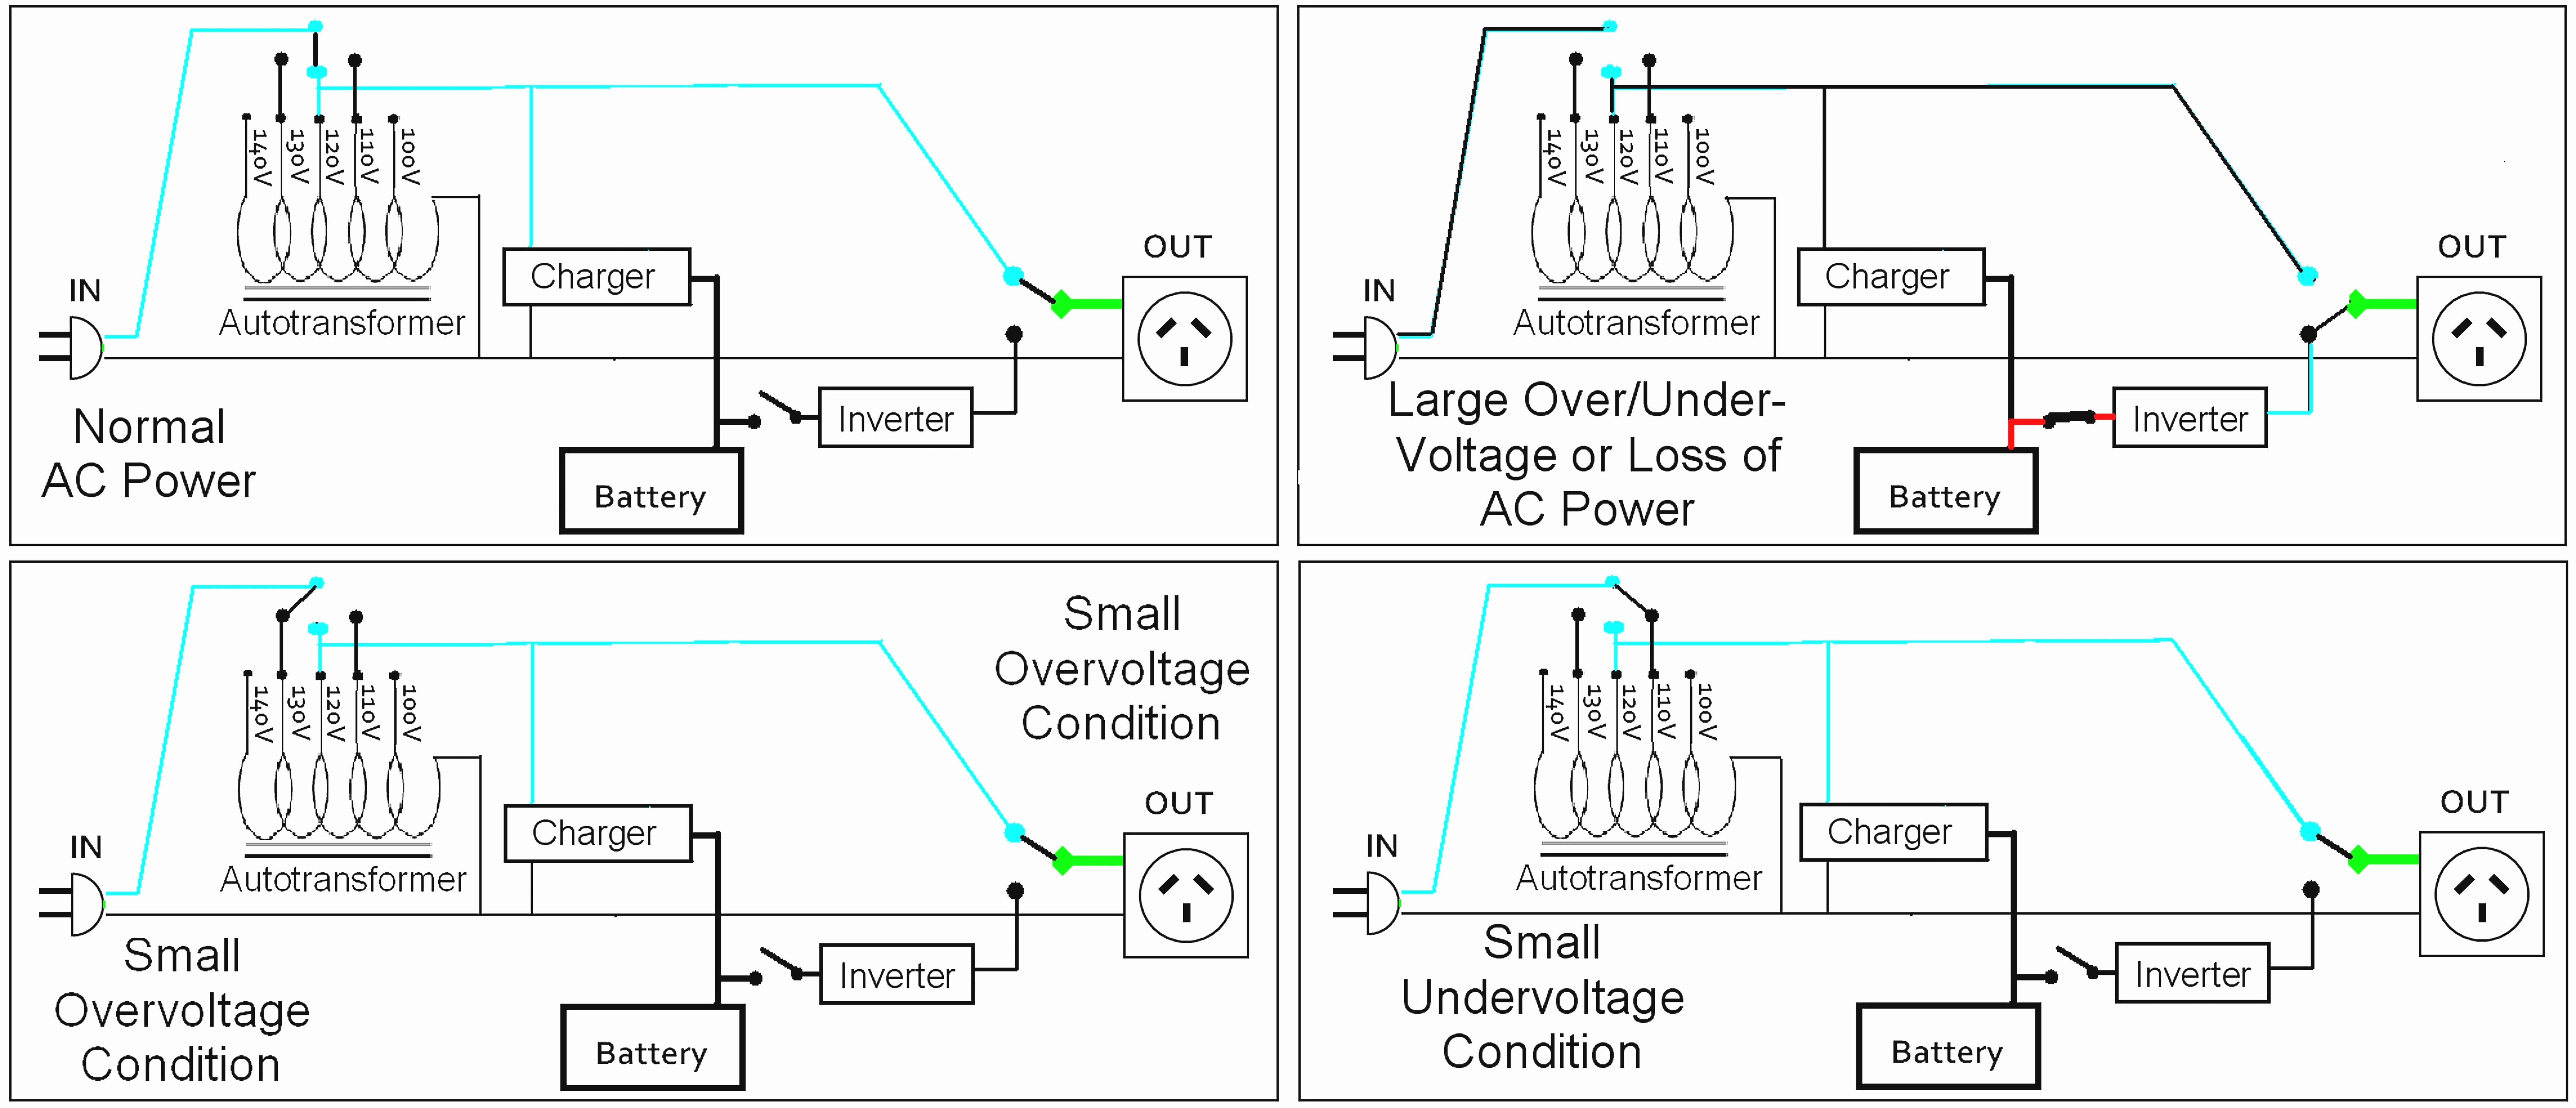 Square D Magnetic Motor Starter Wiring Diagram Elegant Square D - Square D Motor Starters Wiring Diagram